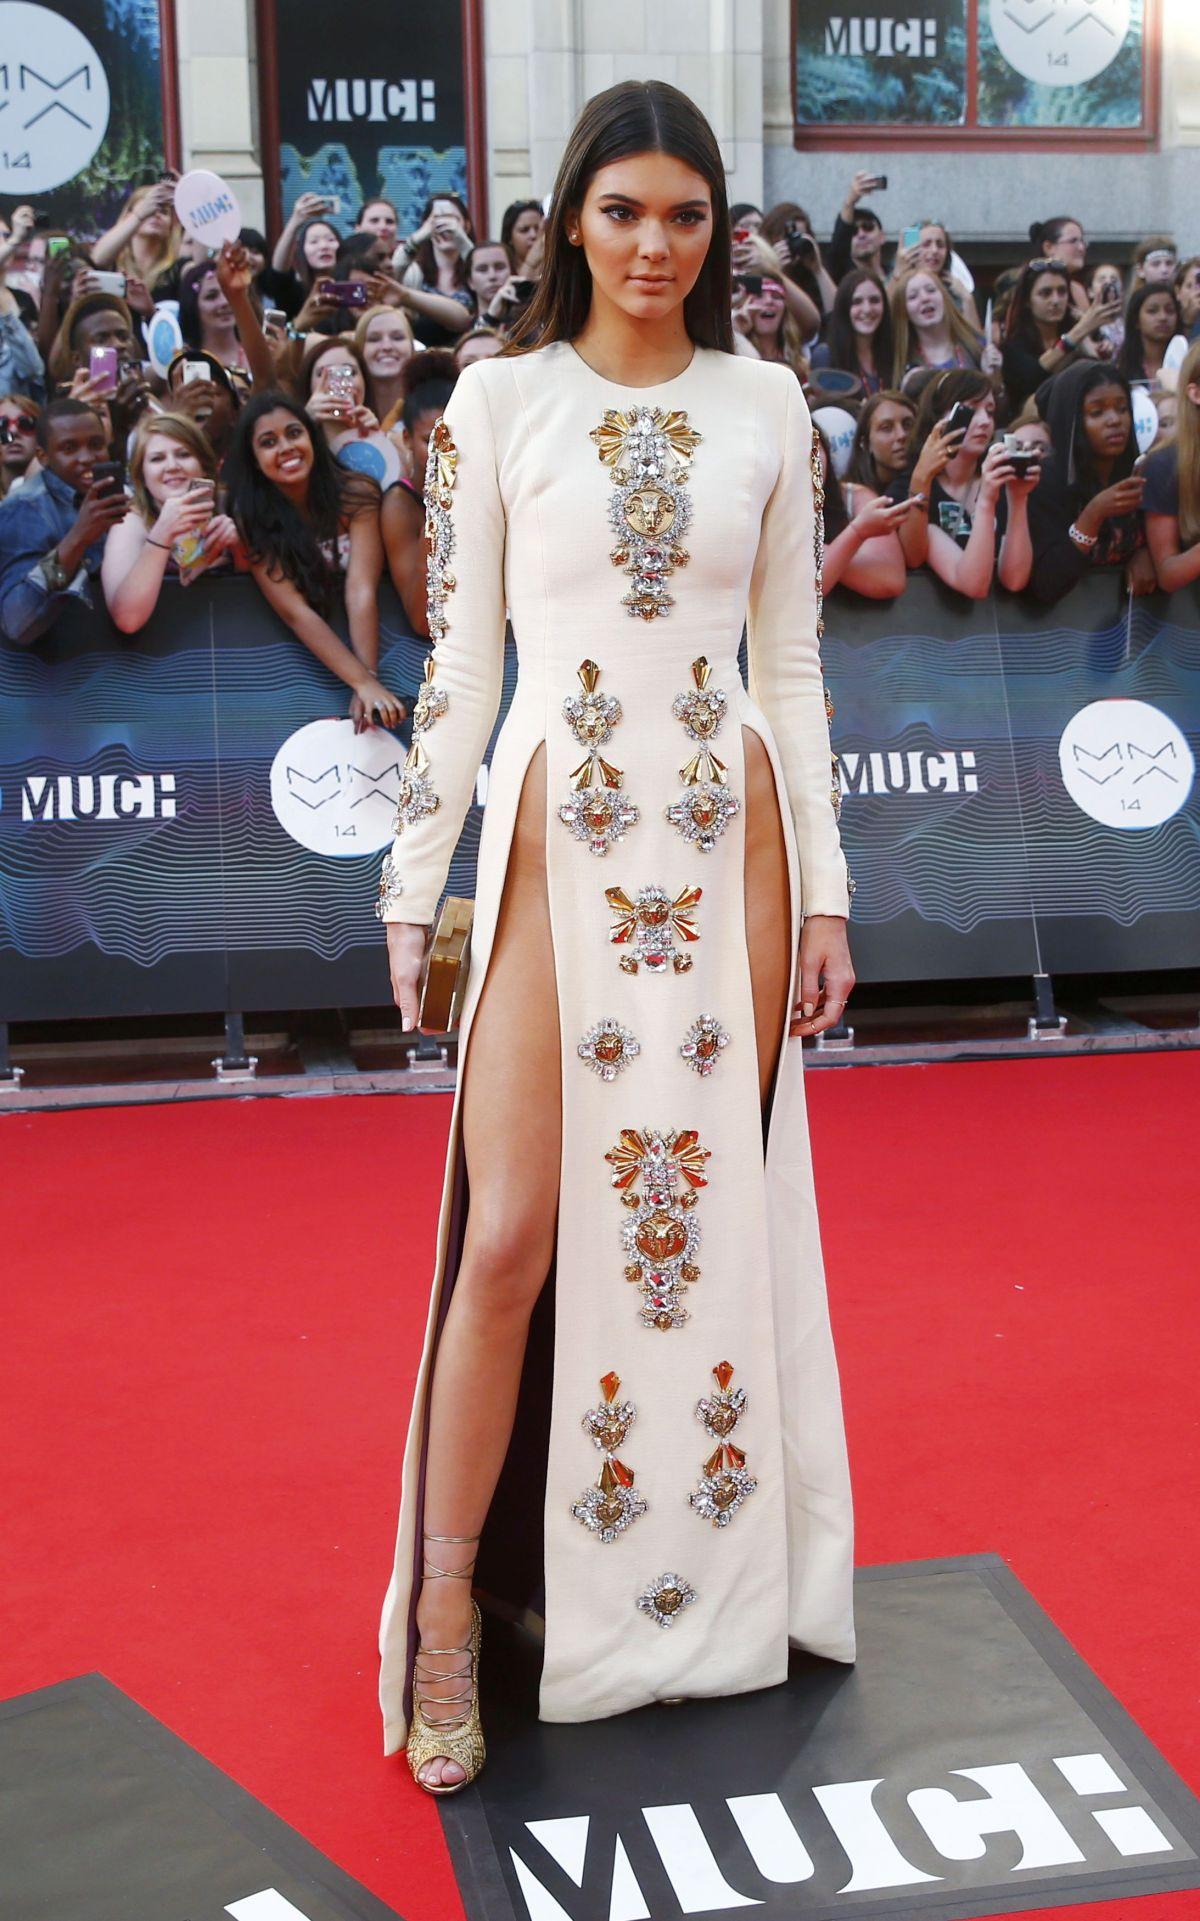 Kendall Jenner Tanpa Pakaian Dalam Di Karpet Merah Ri Cyber - 1200 x 1921 jpeg 289kB